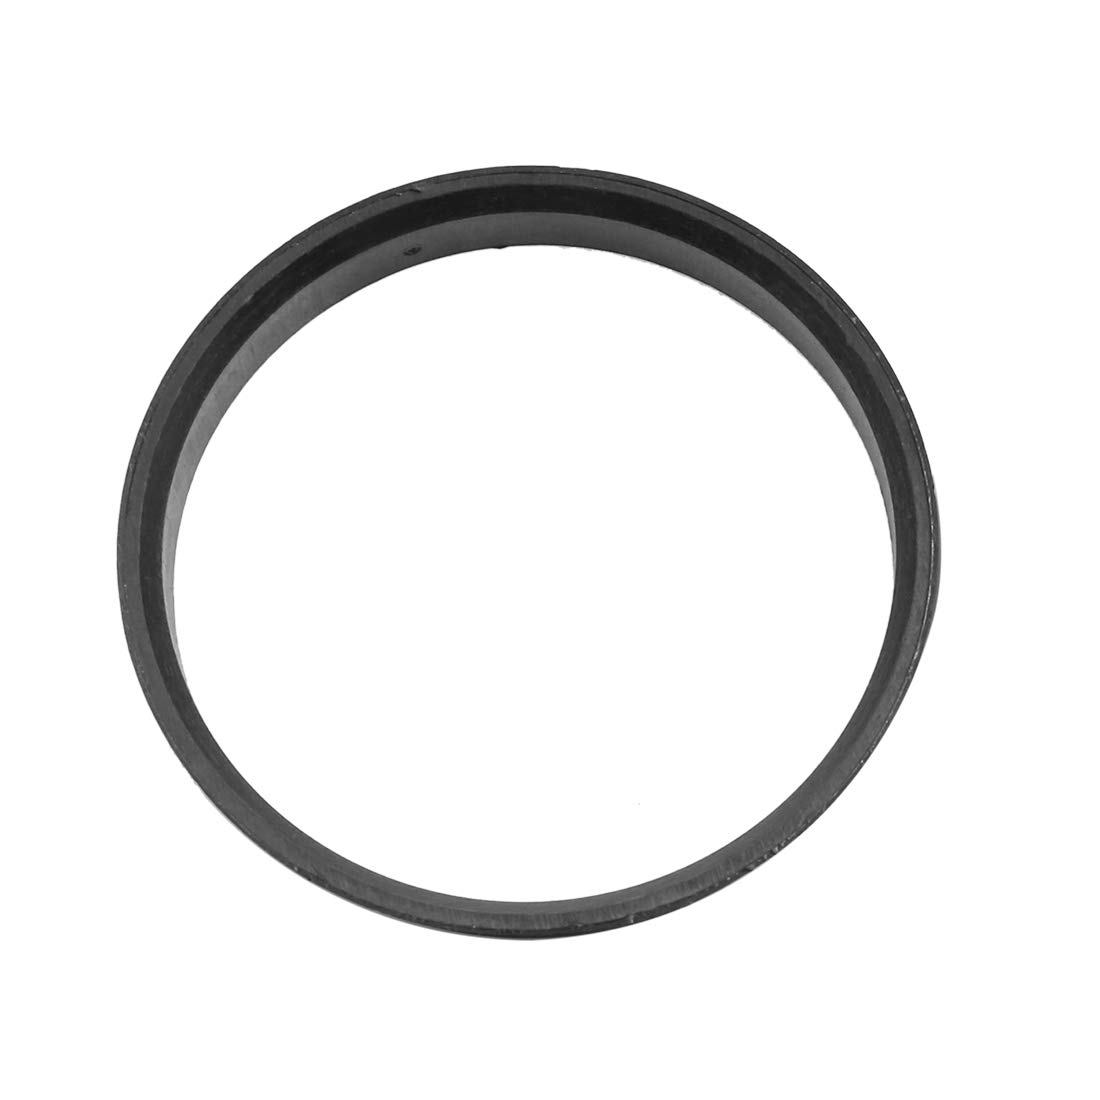 4pcs Aluminium Alloy X AUTOHAUX Car Hub Centric Rings Wheel Bore Center 72.6 to 67.1mm